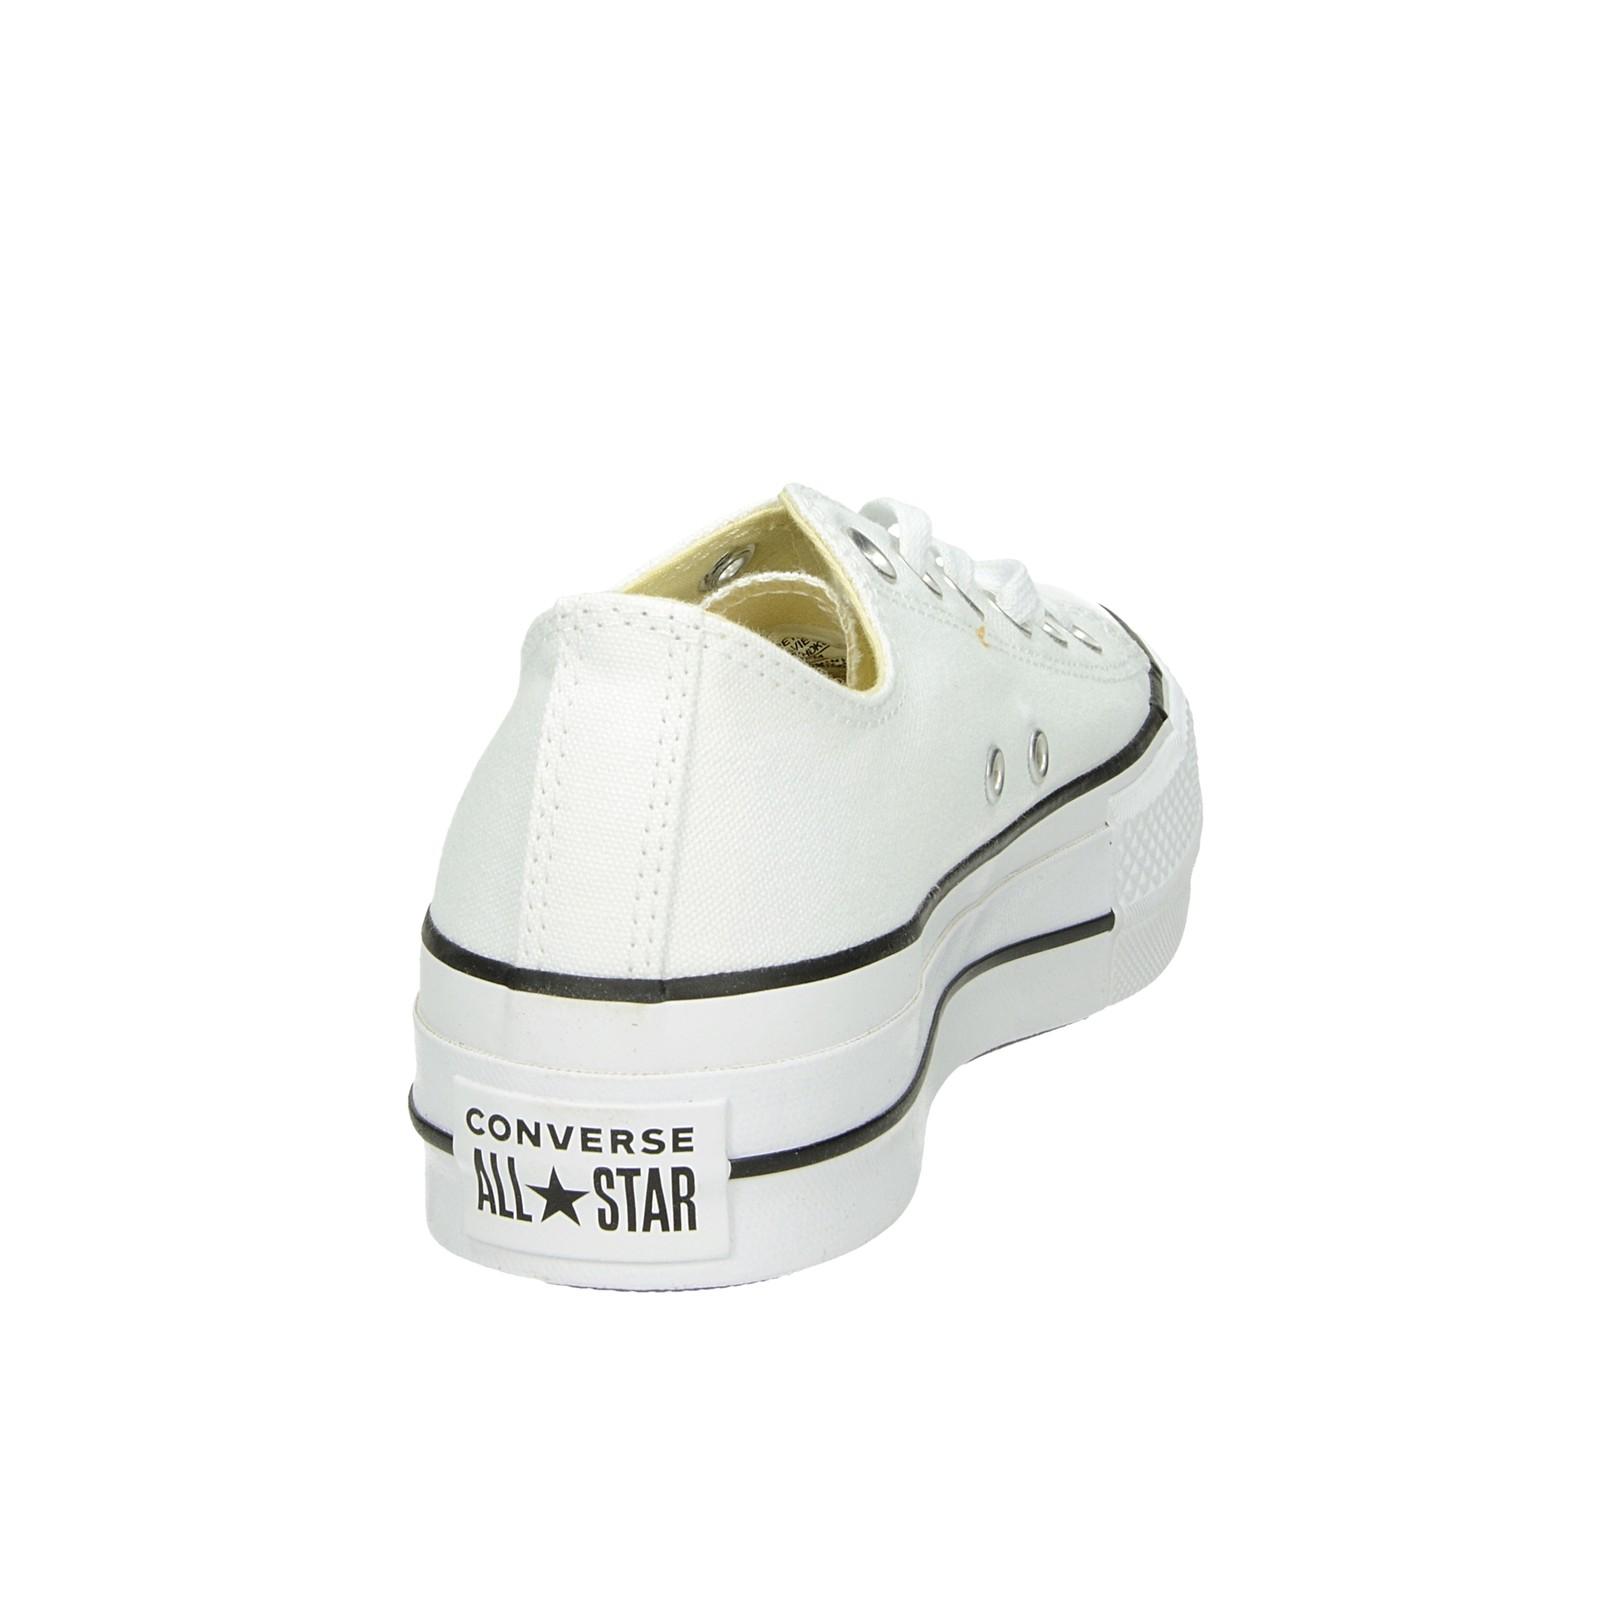 b70d59bbe75c ... Converse dámske štýlové tenisky na platforme - biele ...